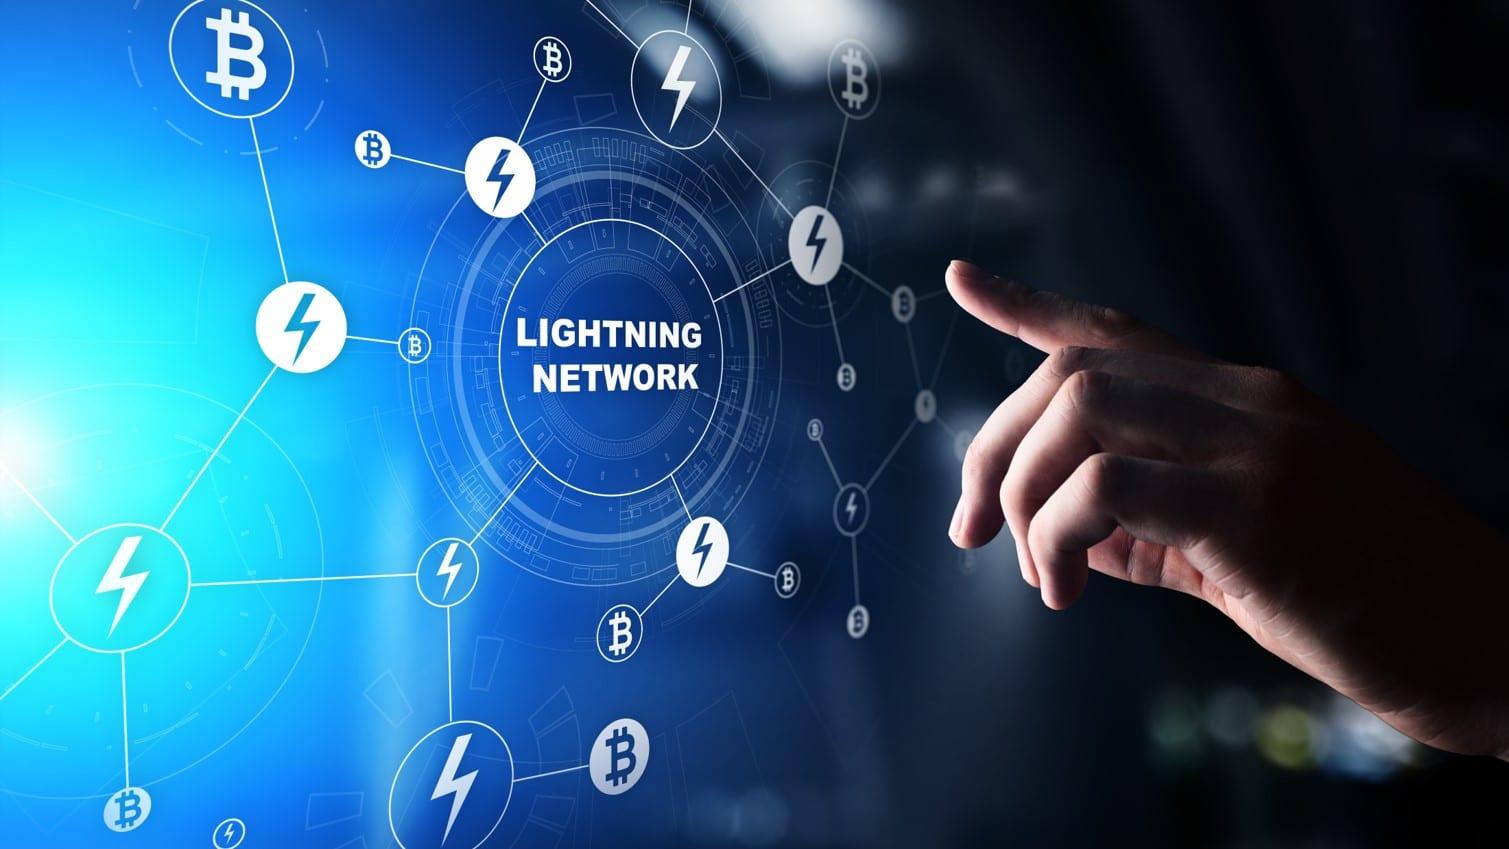 micropagos-lightning-network